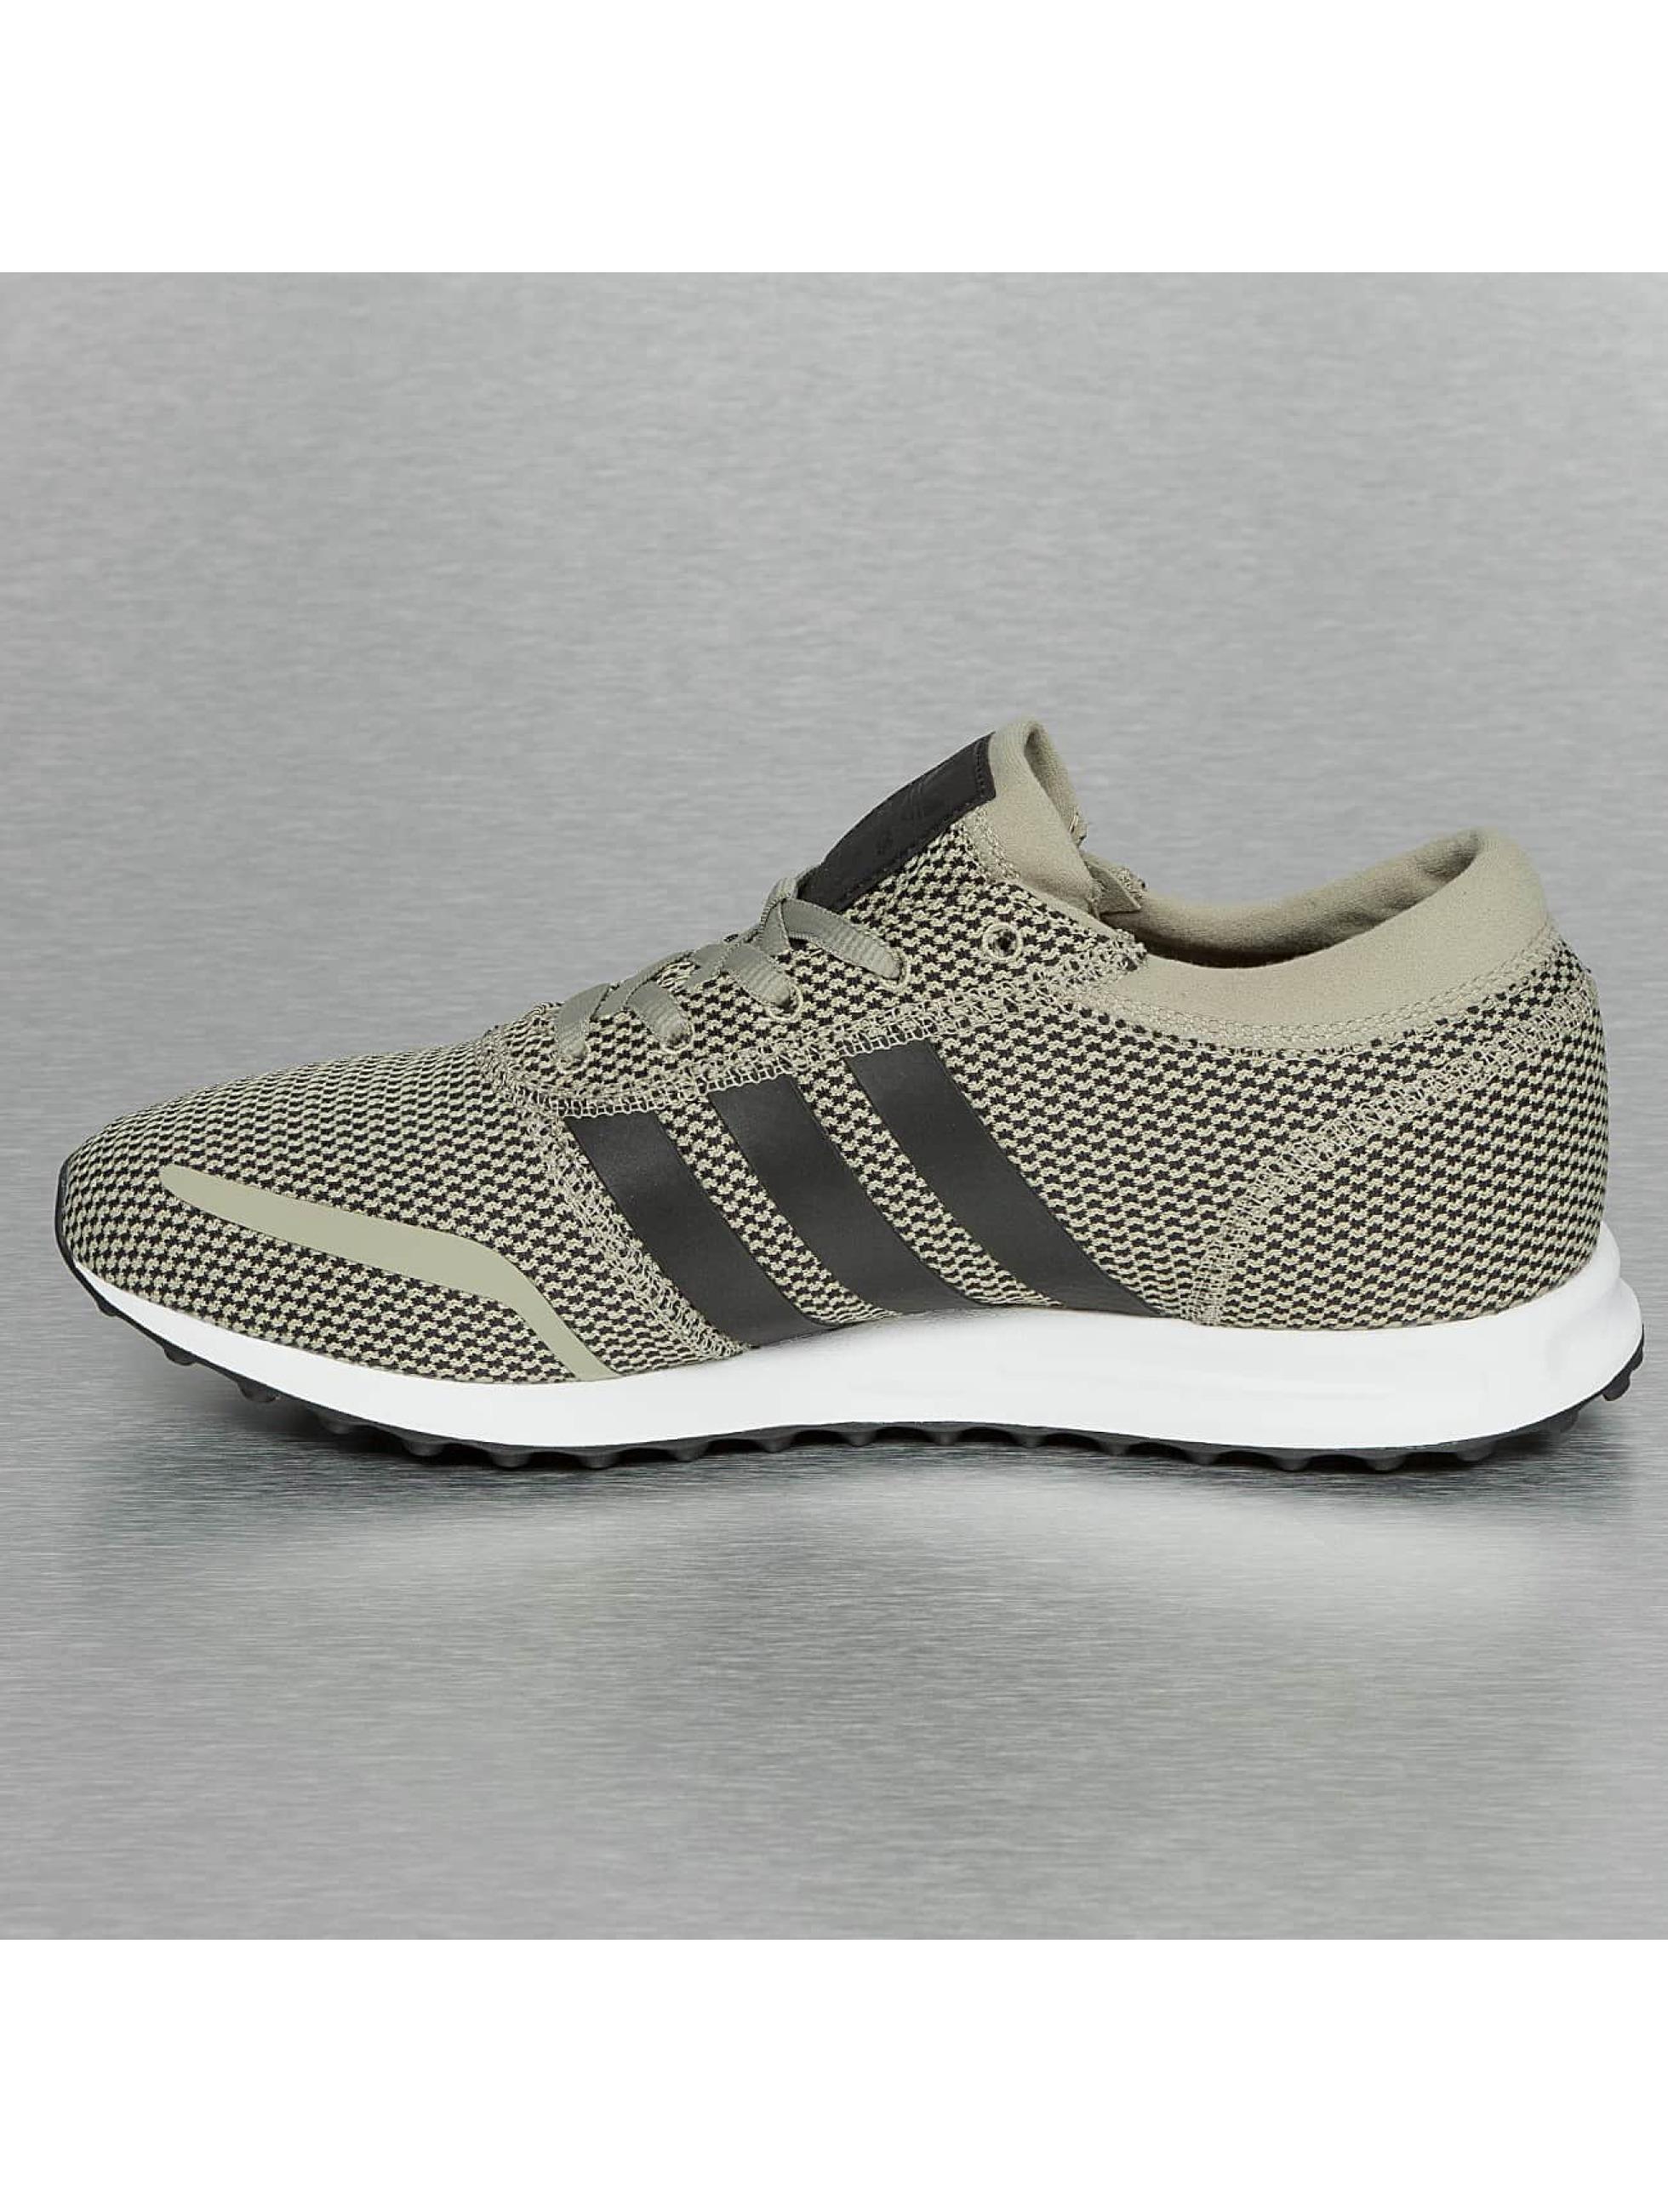 adidas schoen sneaker los angeles in beige 302813. Black Bedroom Furniture Sets. Home Design Ideas